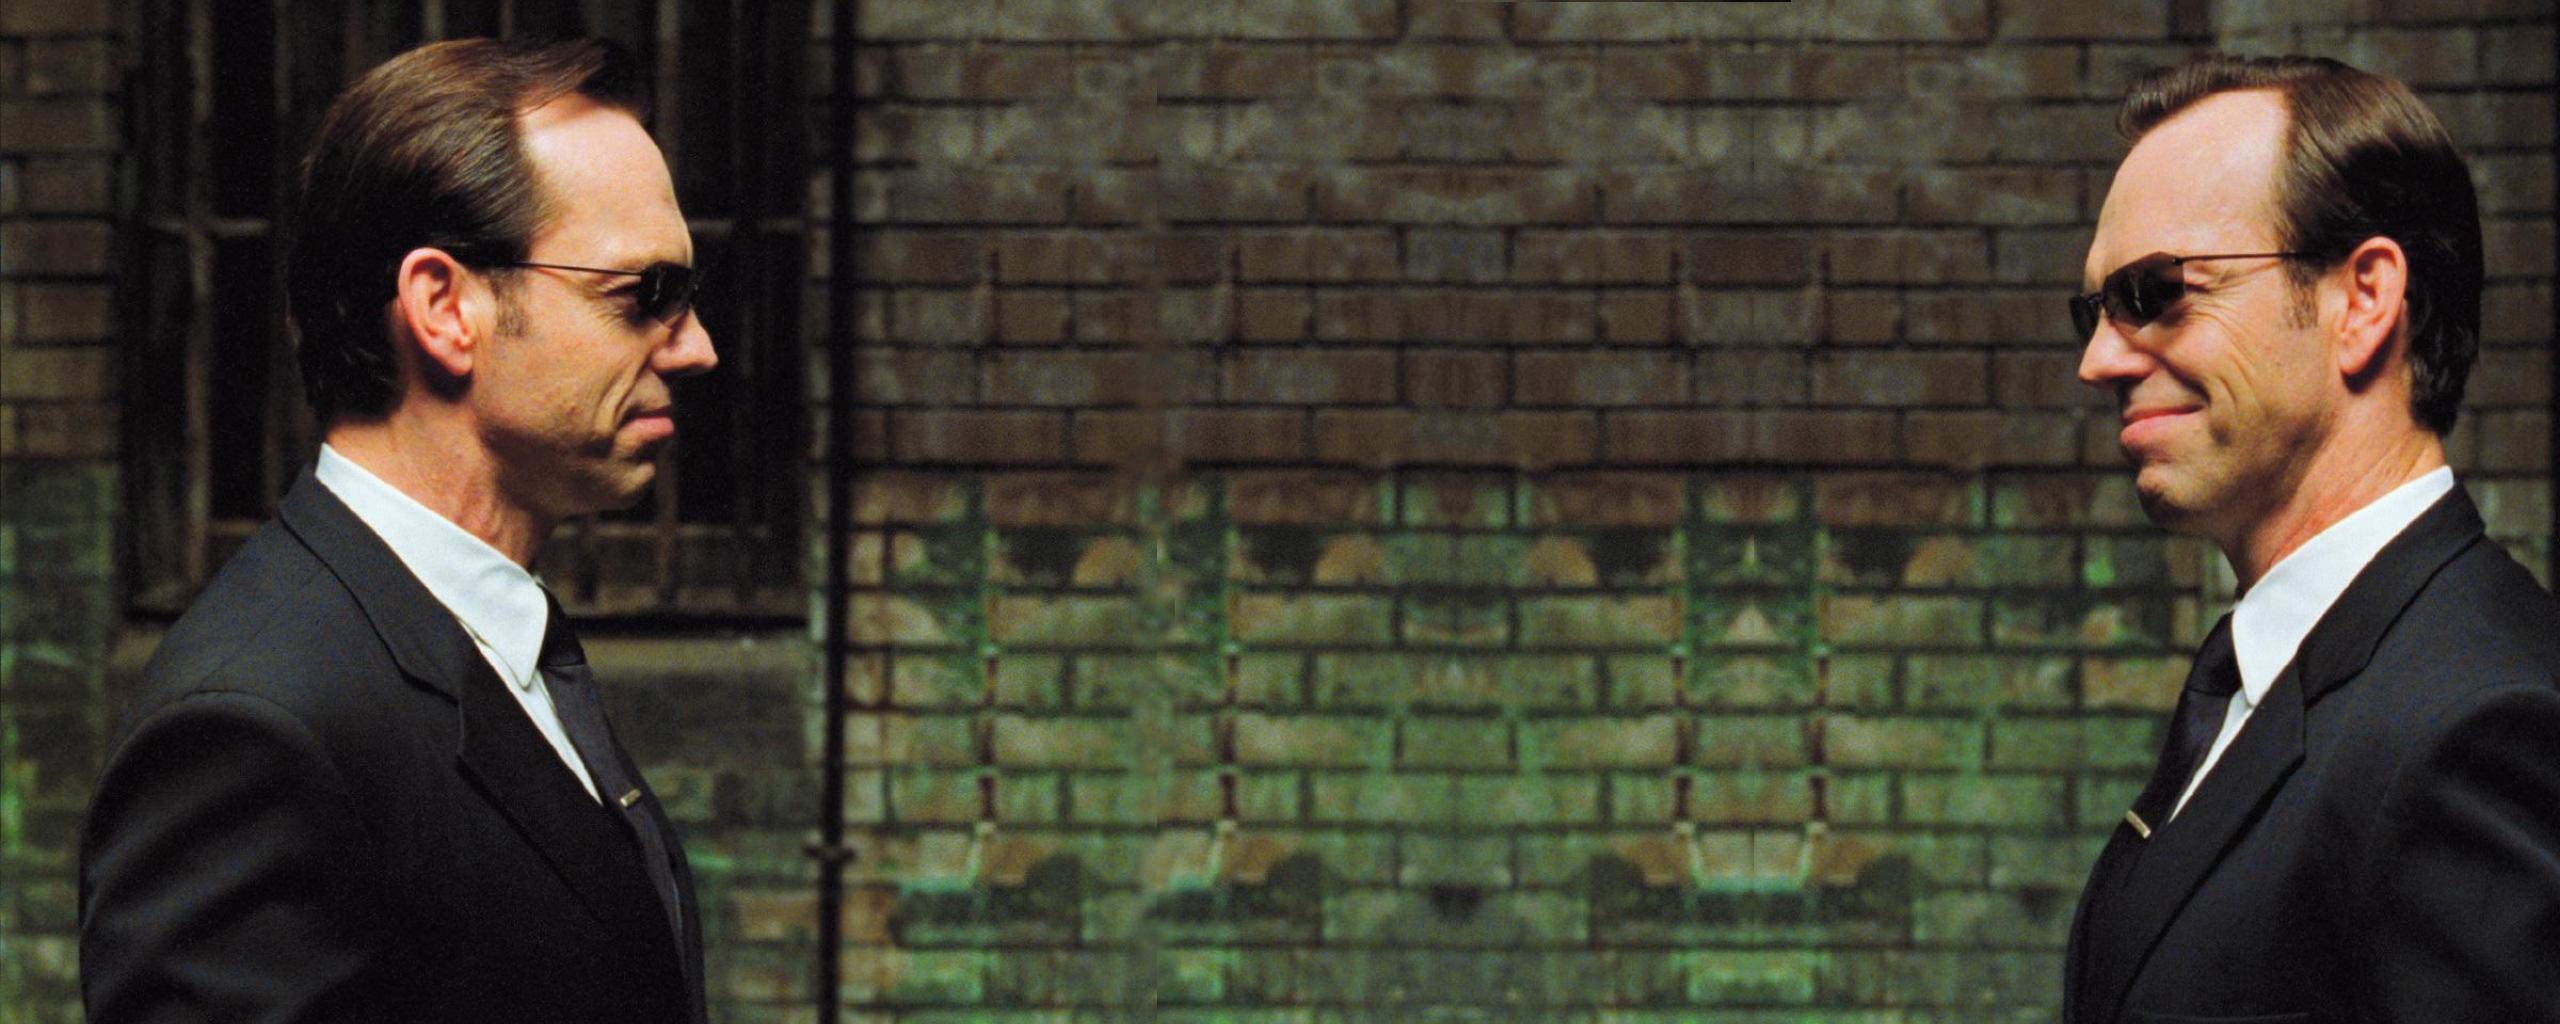 3360x1050 wallpaper windows 7